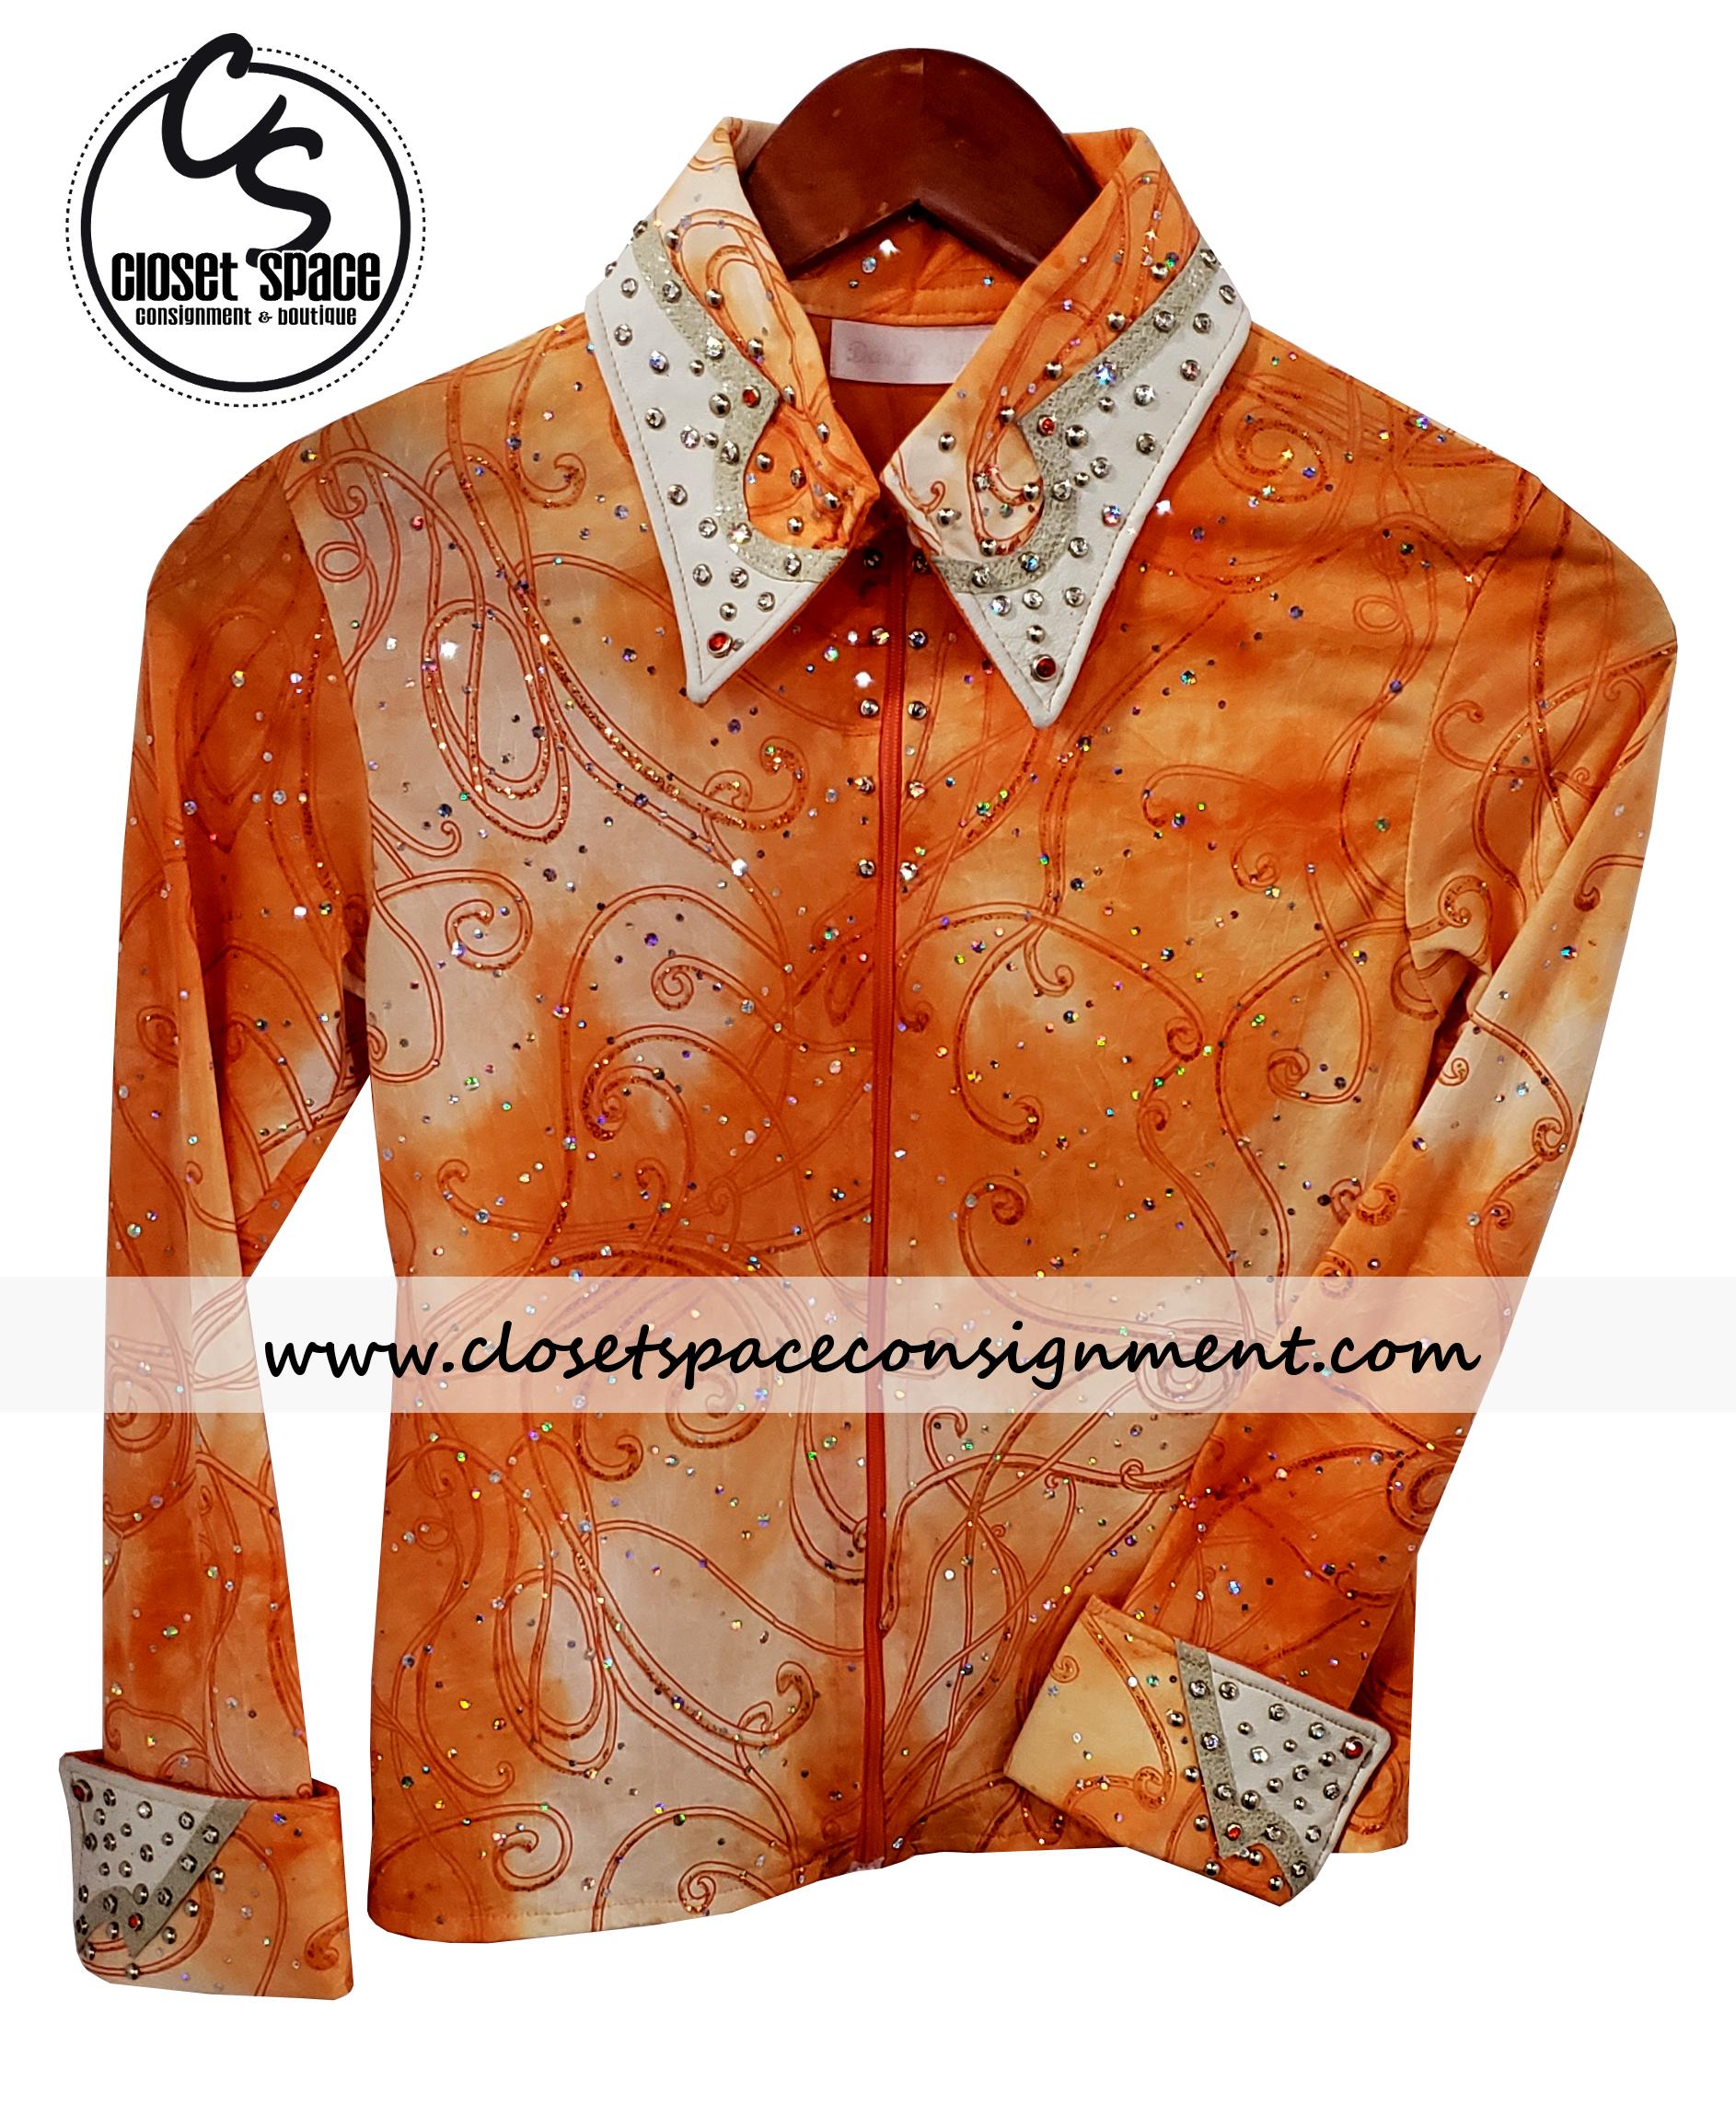 'Dar Designs' Orange Showmanship Set 3HH1